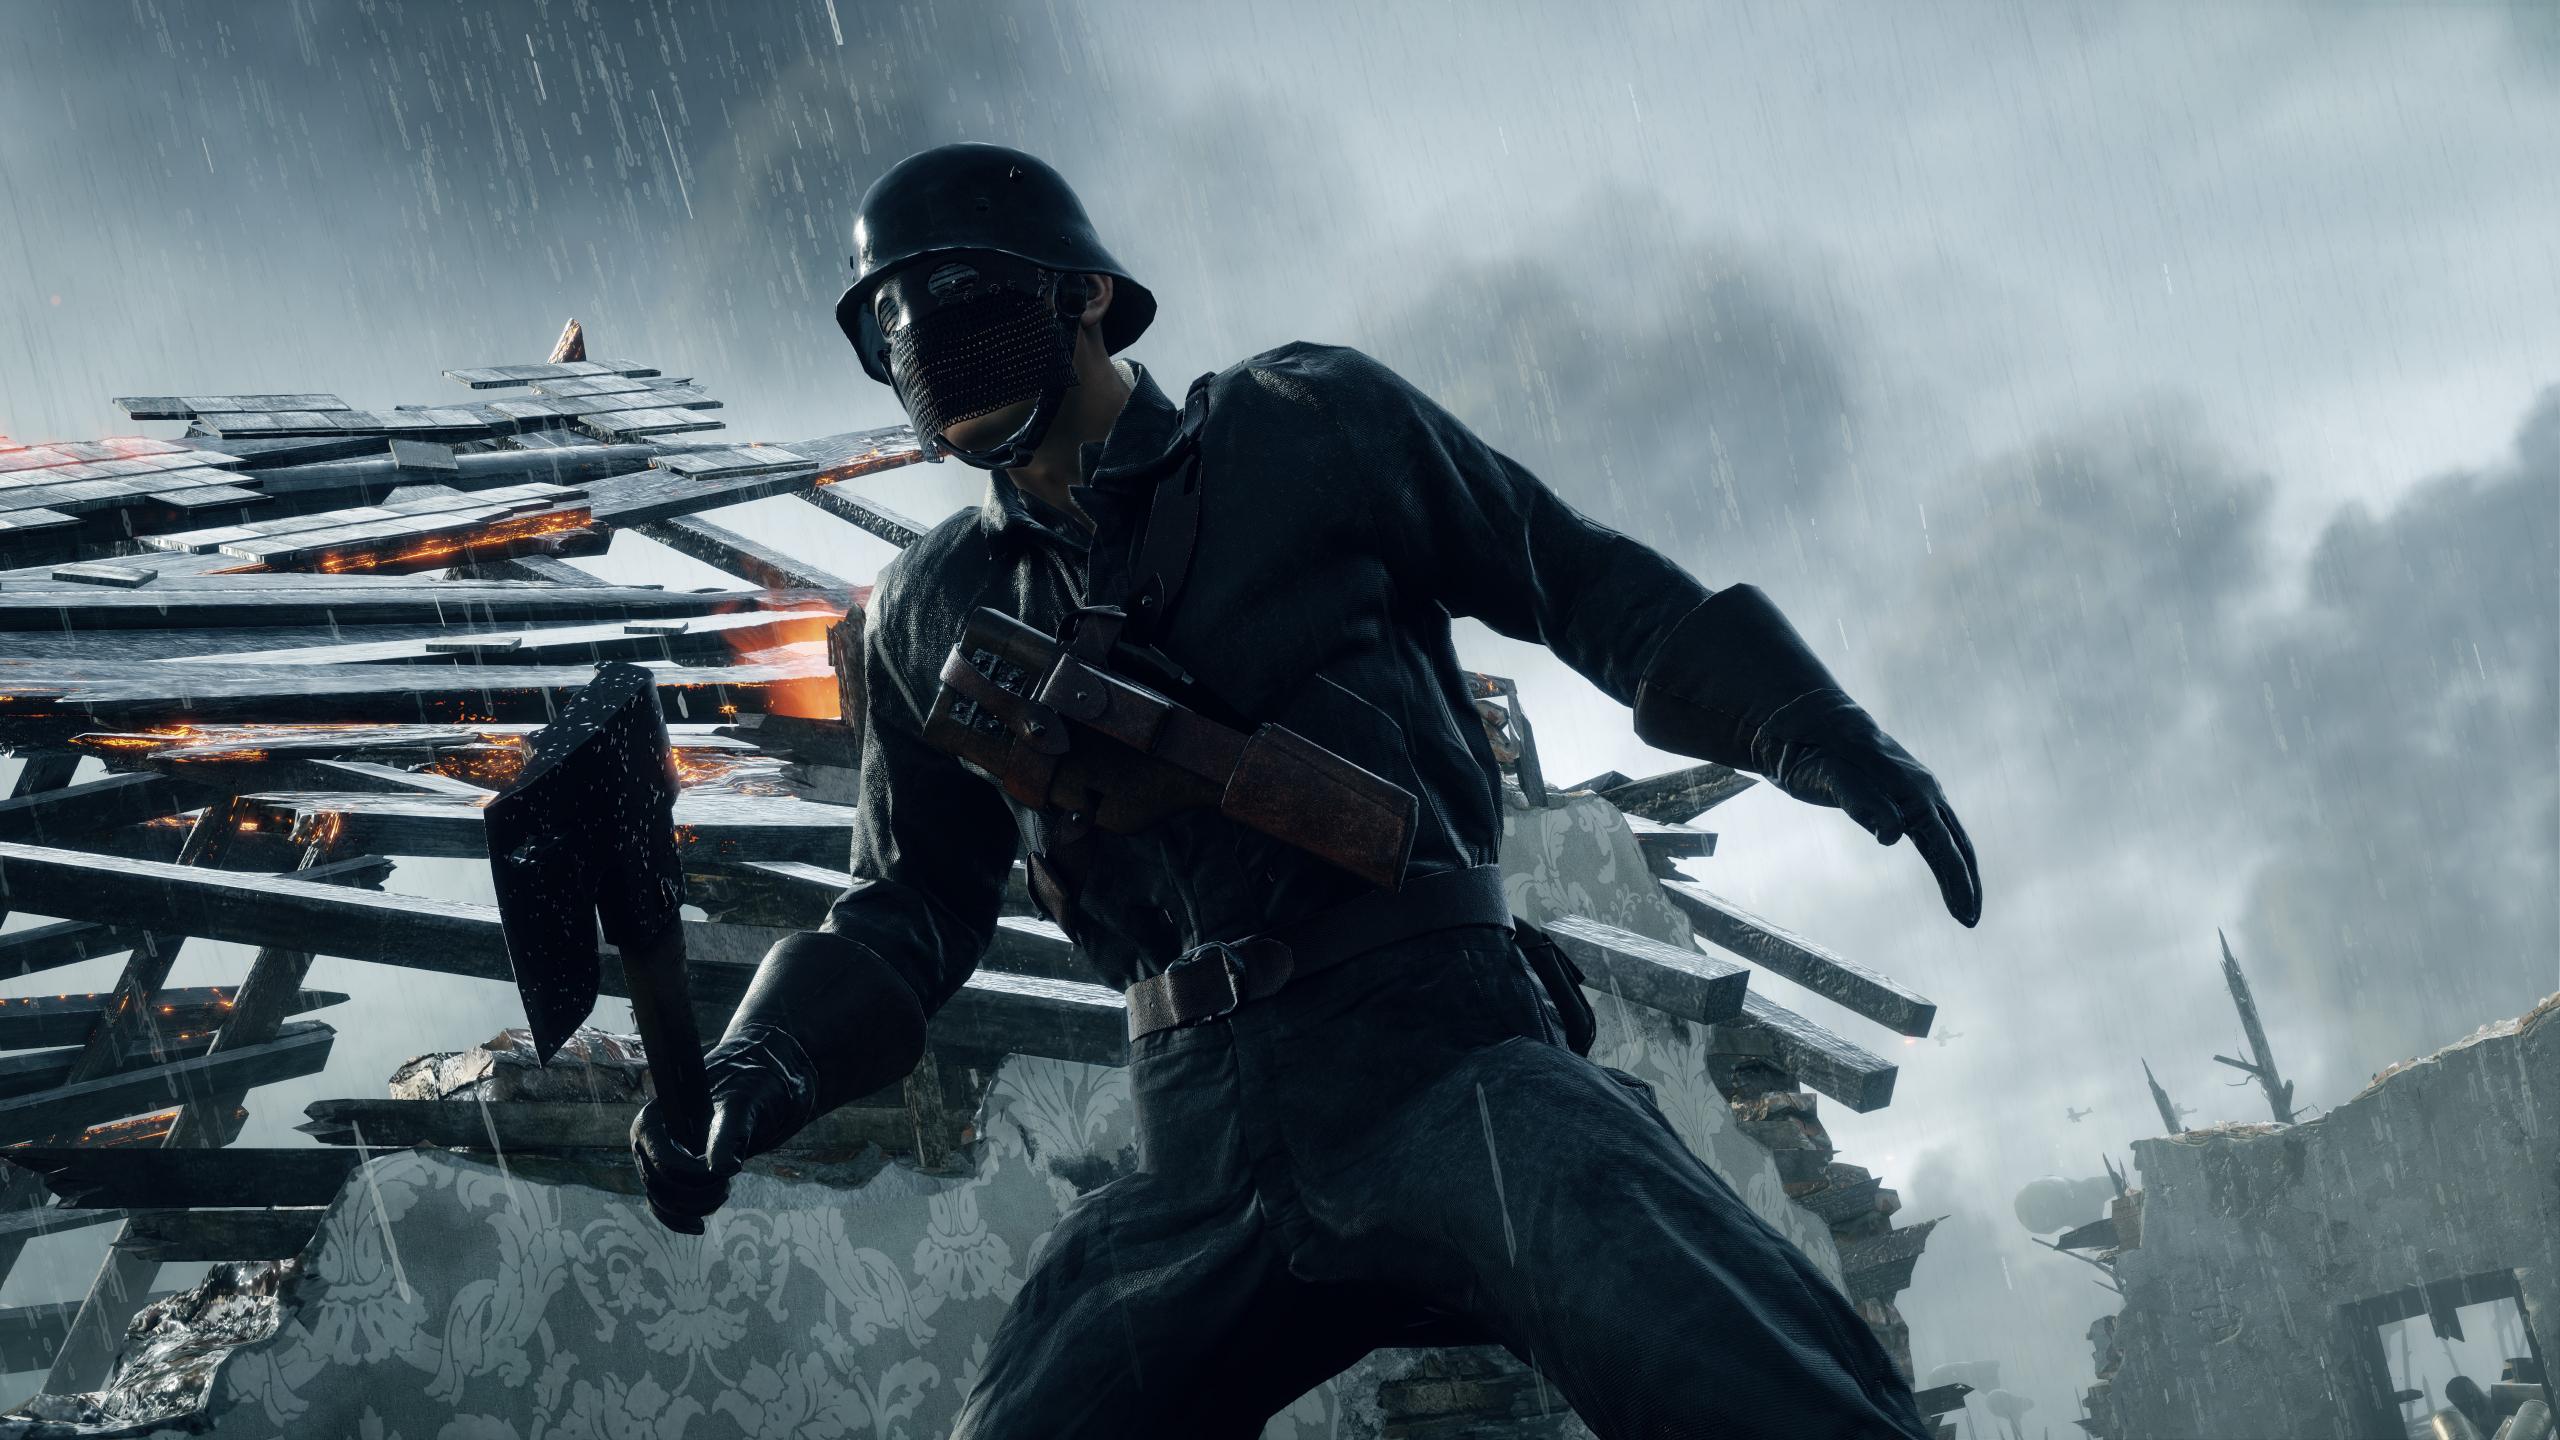 2560x1440 wallpaper Battlefield 1 gaming